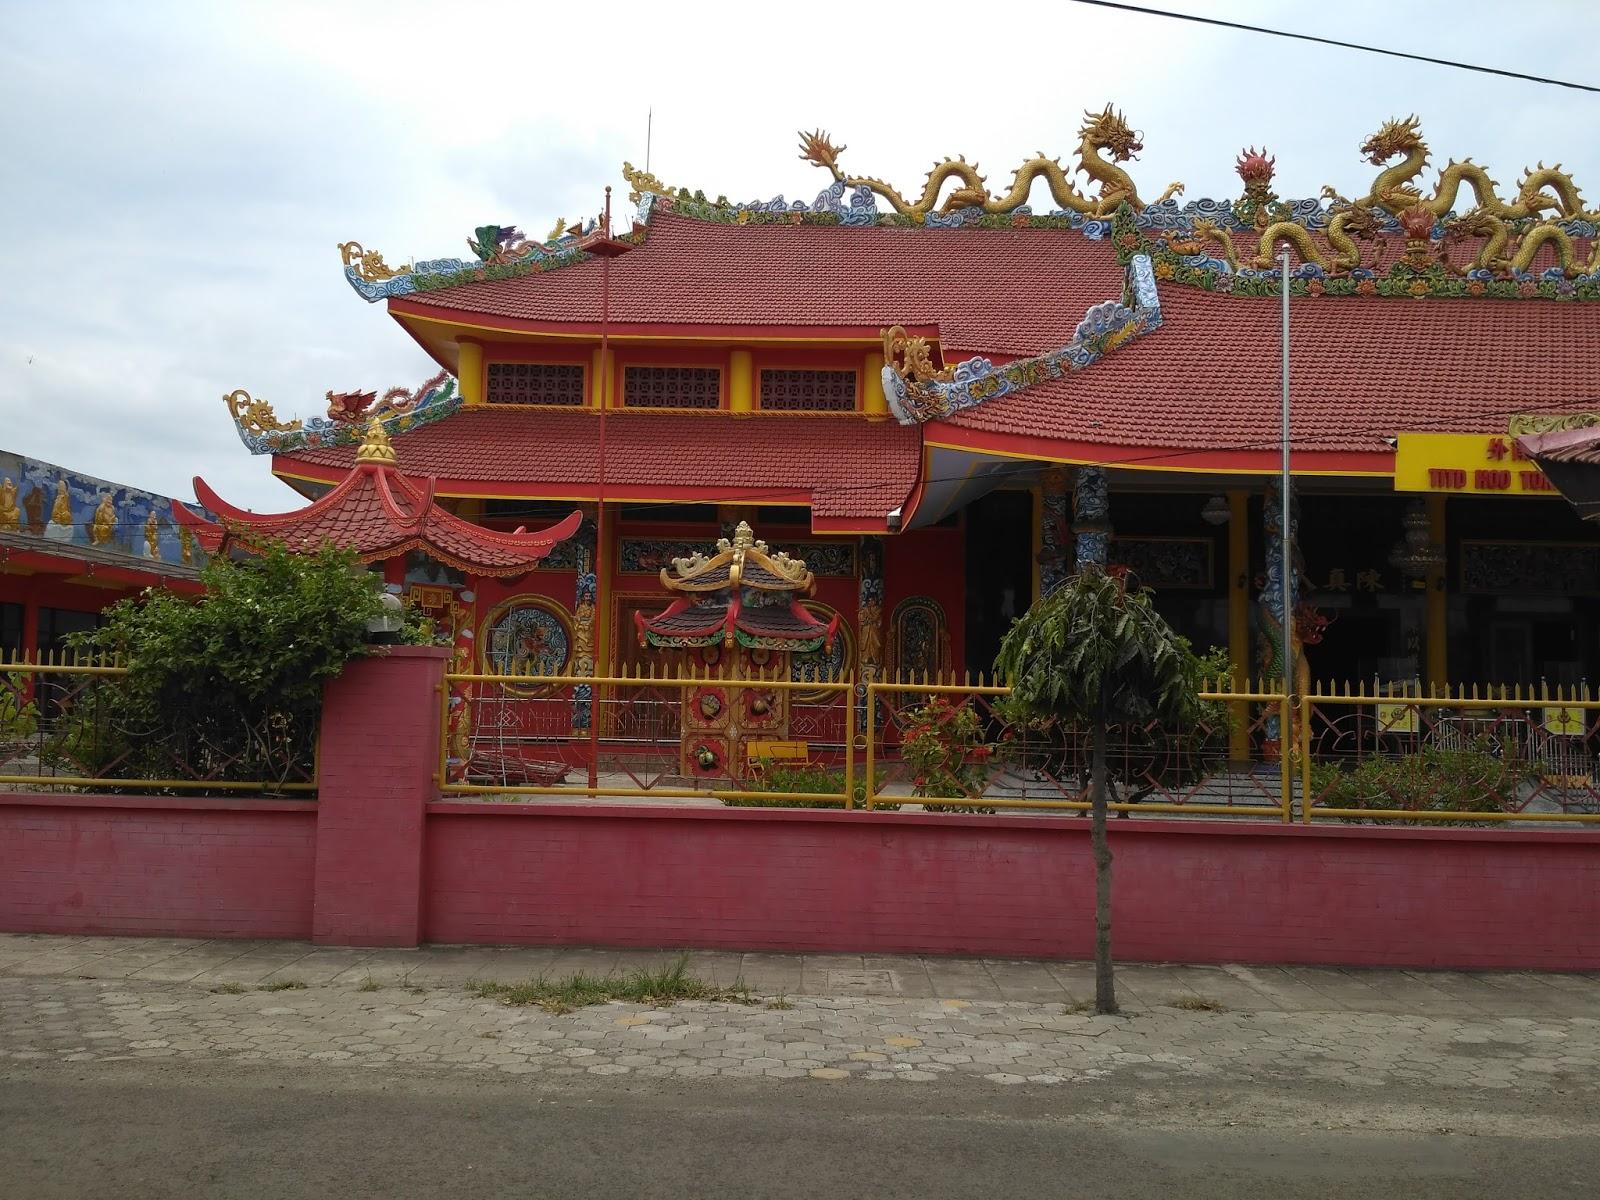 Hoo Tong Bio Banyuwangi Kelenteng 300 Klenteng Jl Ikan Gurami